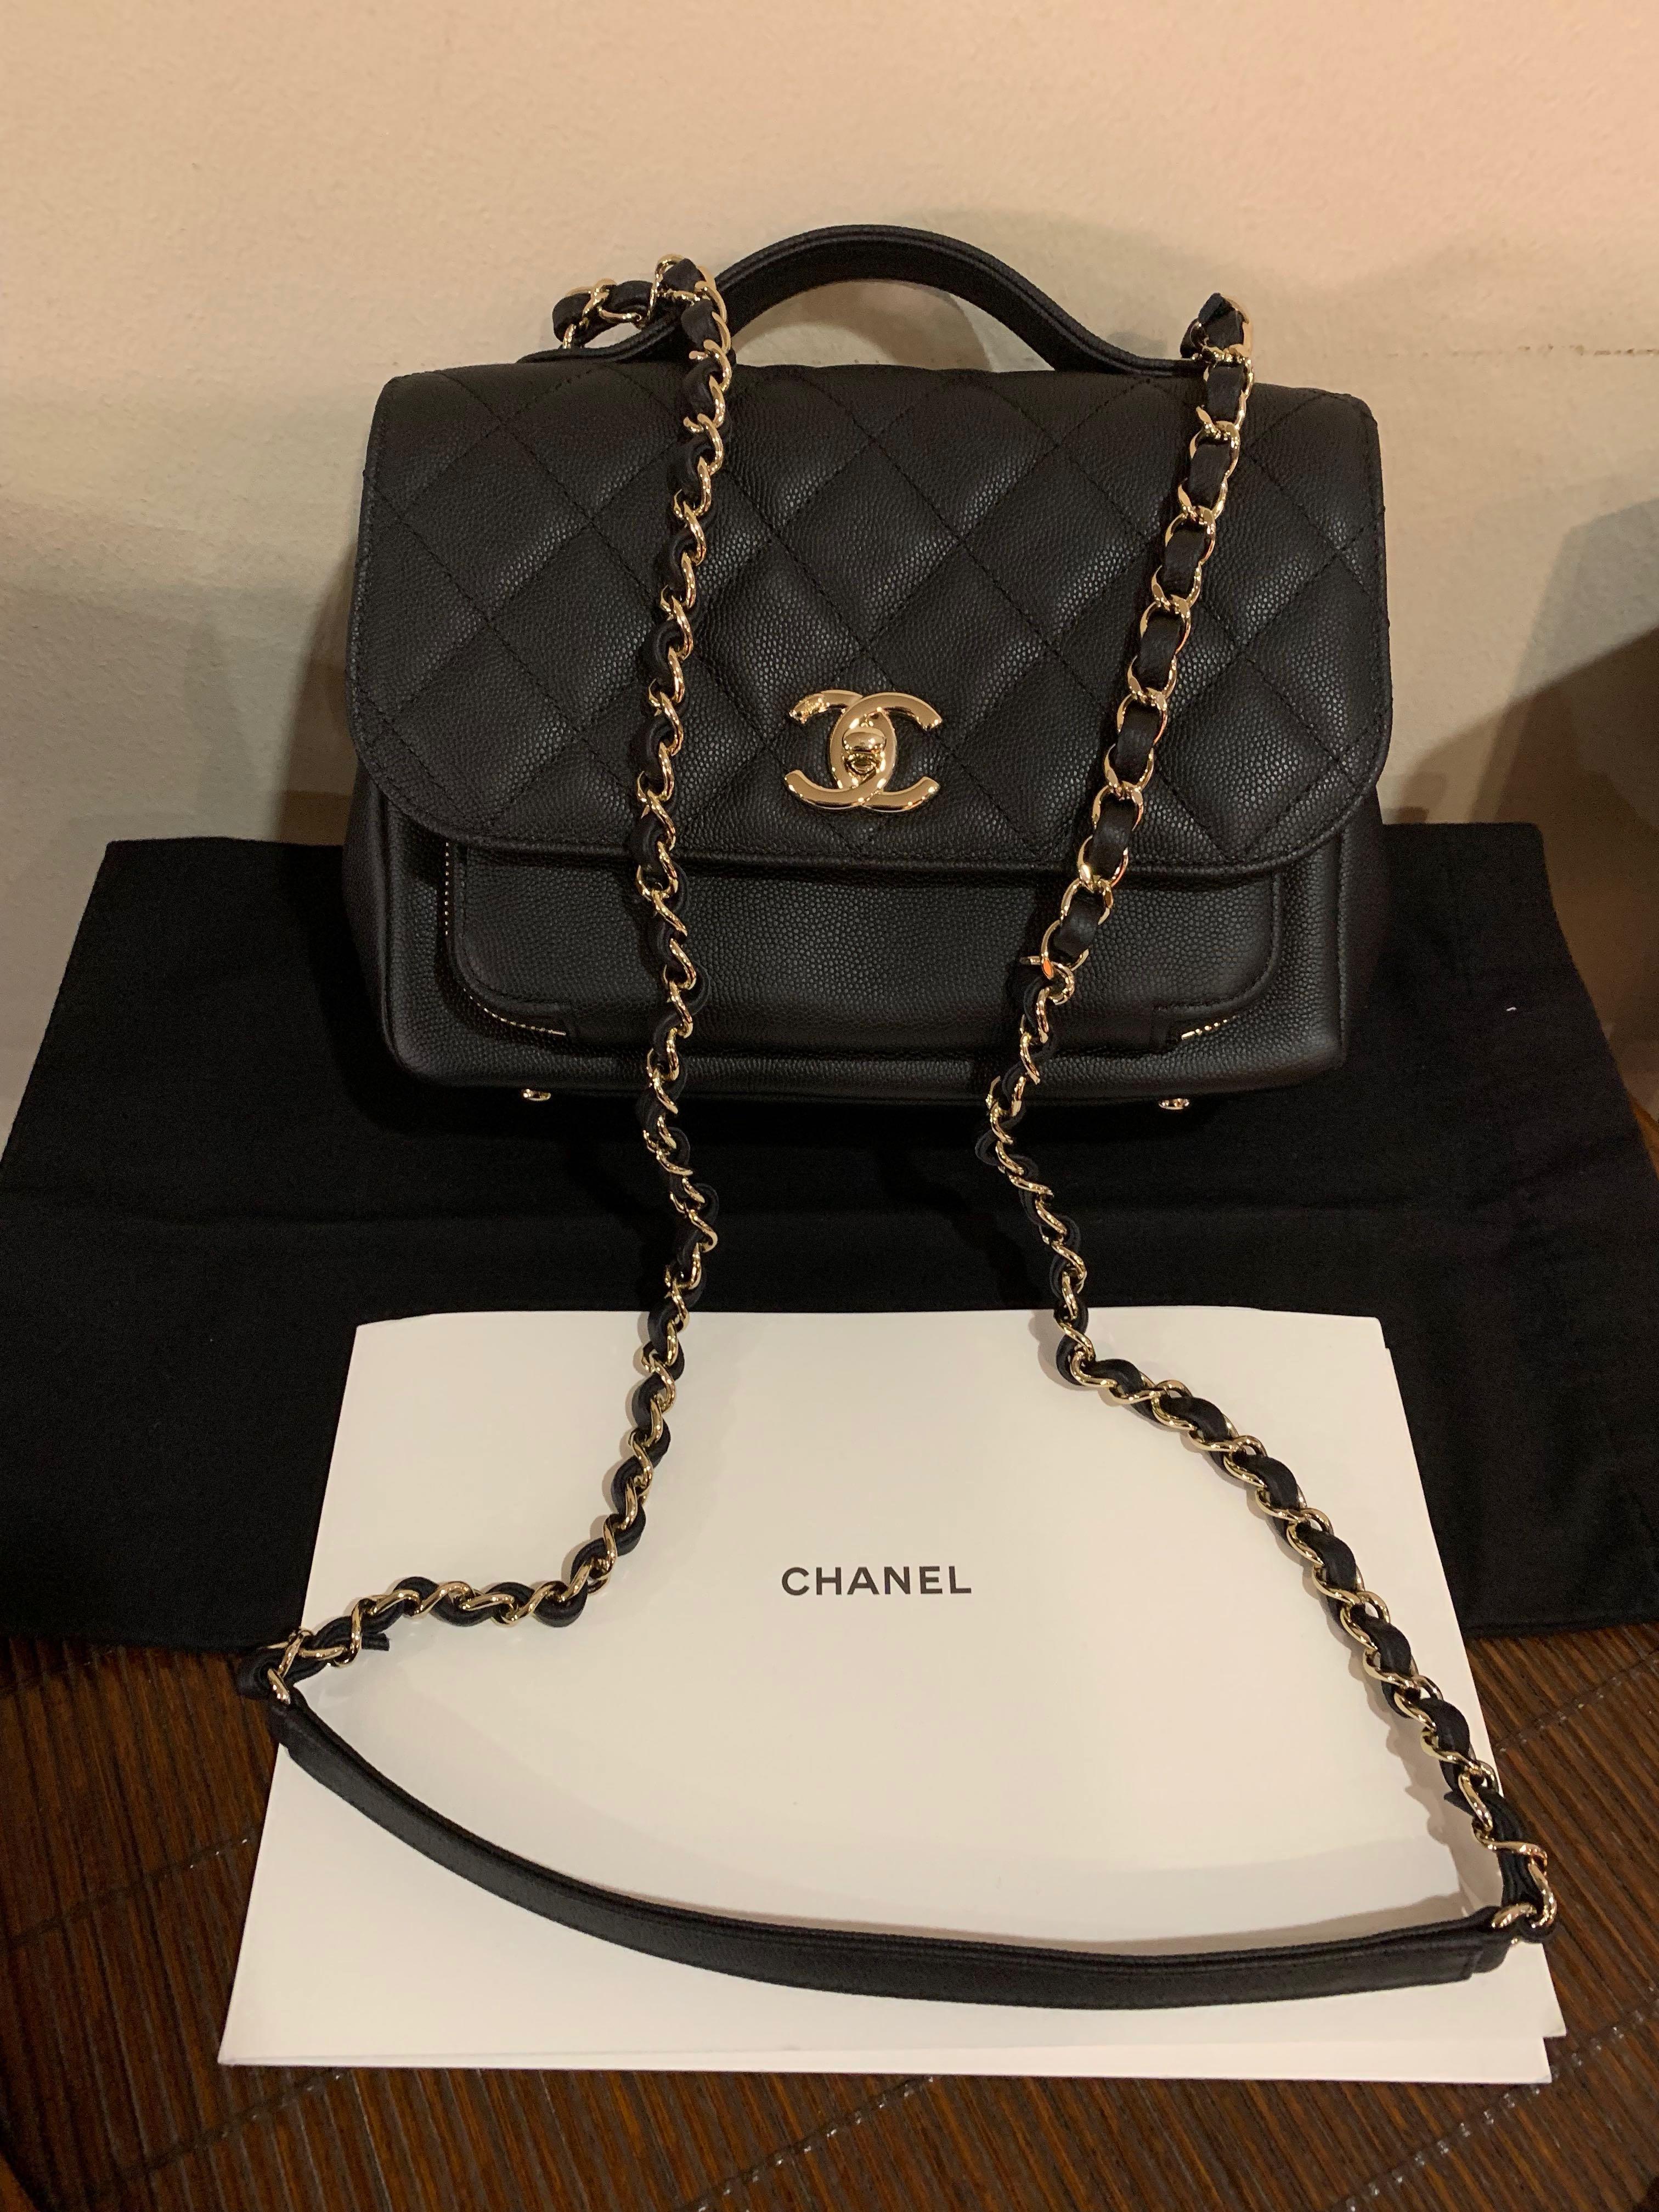 8609c8a592c8 Chanel Affinity Medium Black Caviar w/Champagne Hardware , Luxury ...